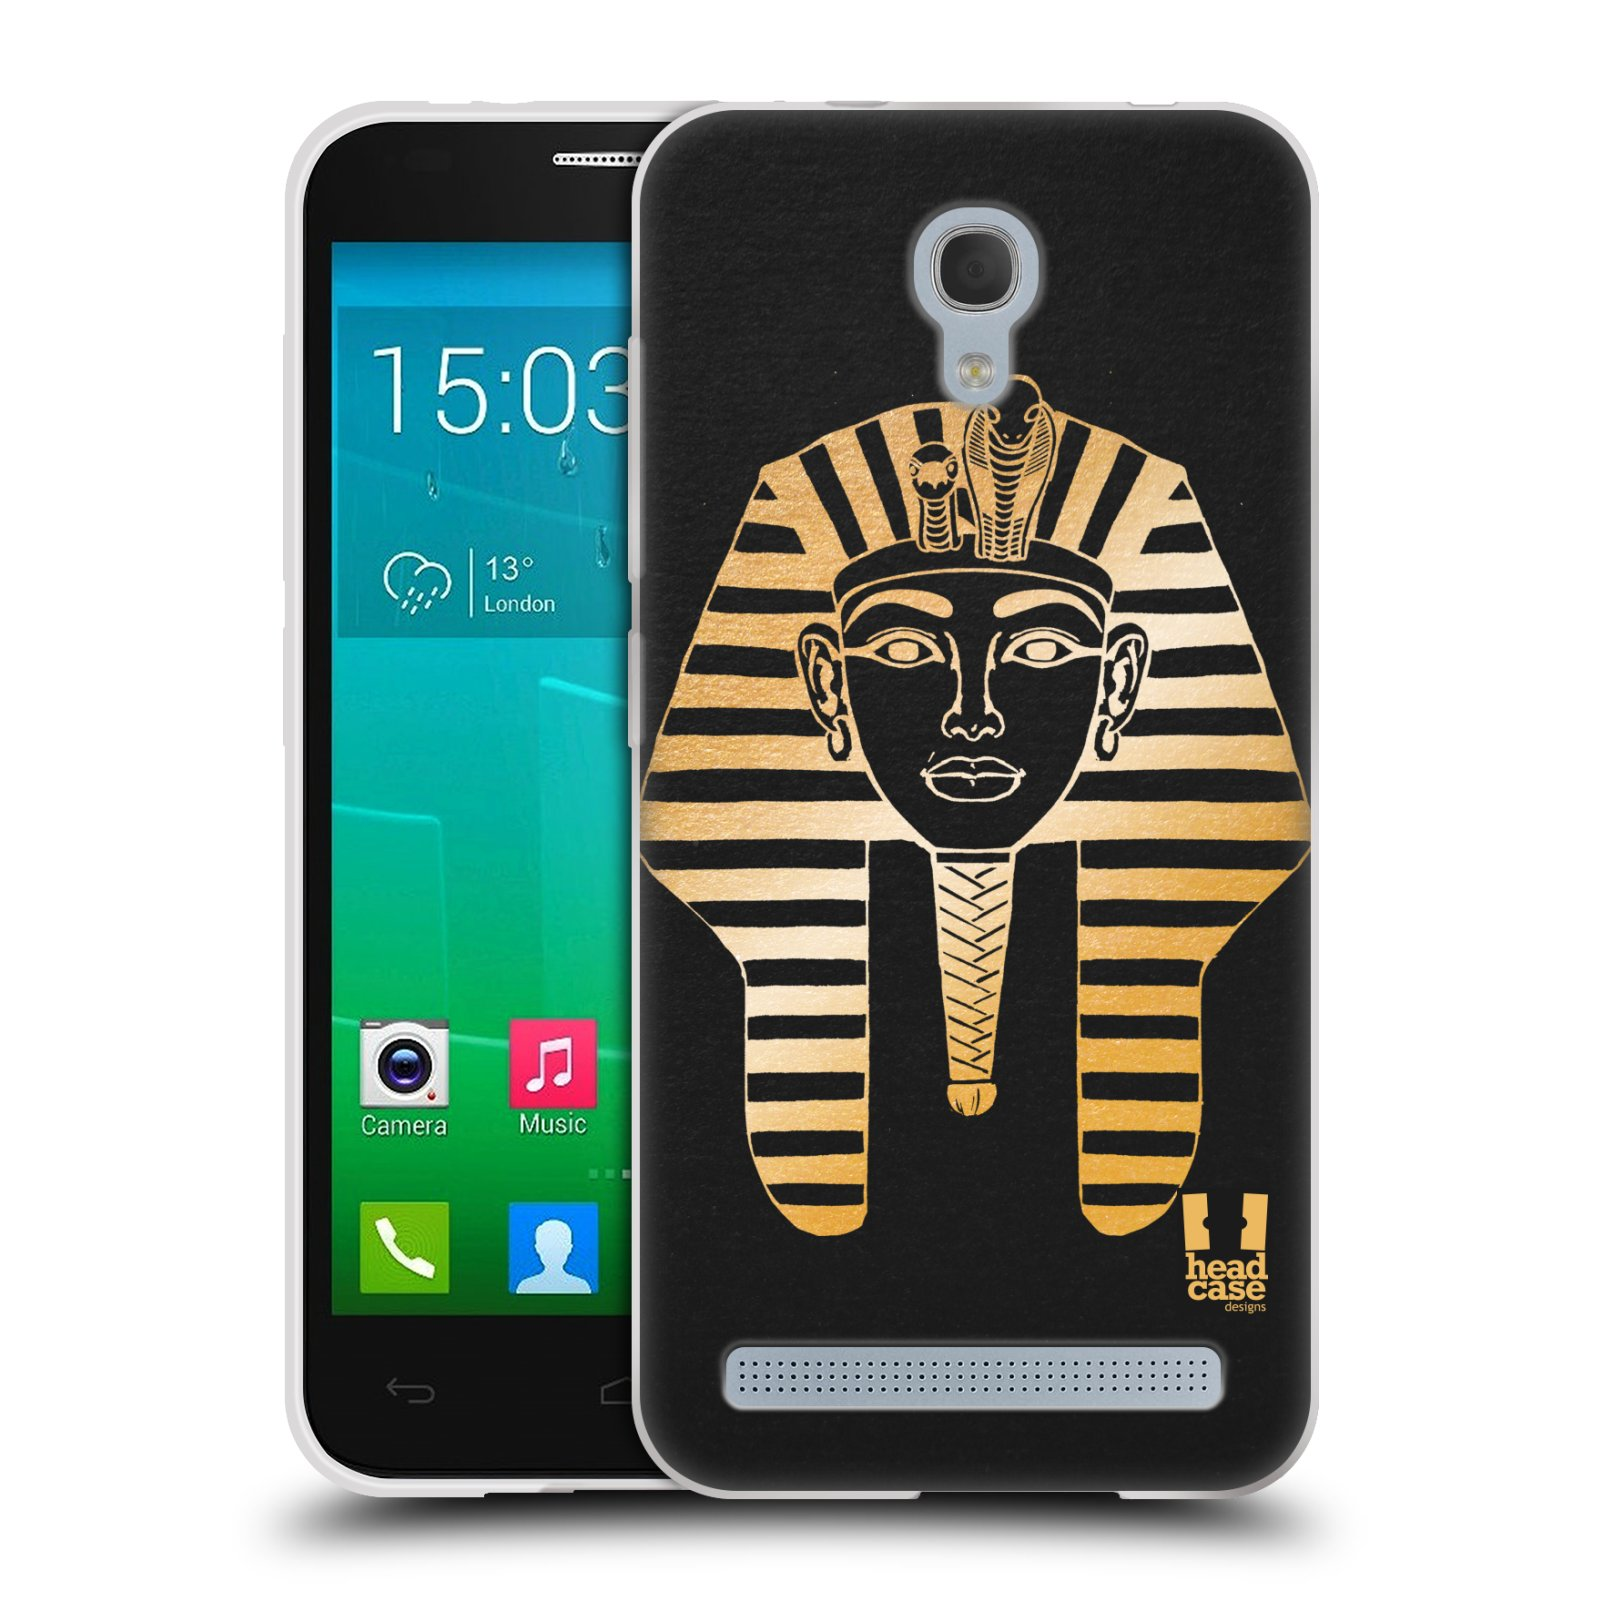 Silikonové pouzdro na mobil Alcatel One Touch Idol 2 Mini S 6036Y HEAD CASE EGYPT FARAON (Silikonový kryt či obal na mobilní telefon Alcatel Idol 2 Mini S OT-6036Y)